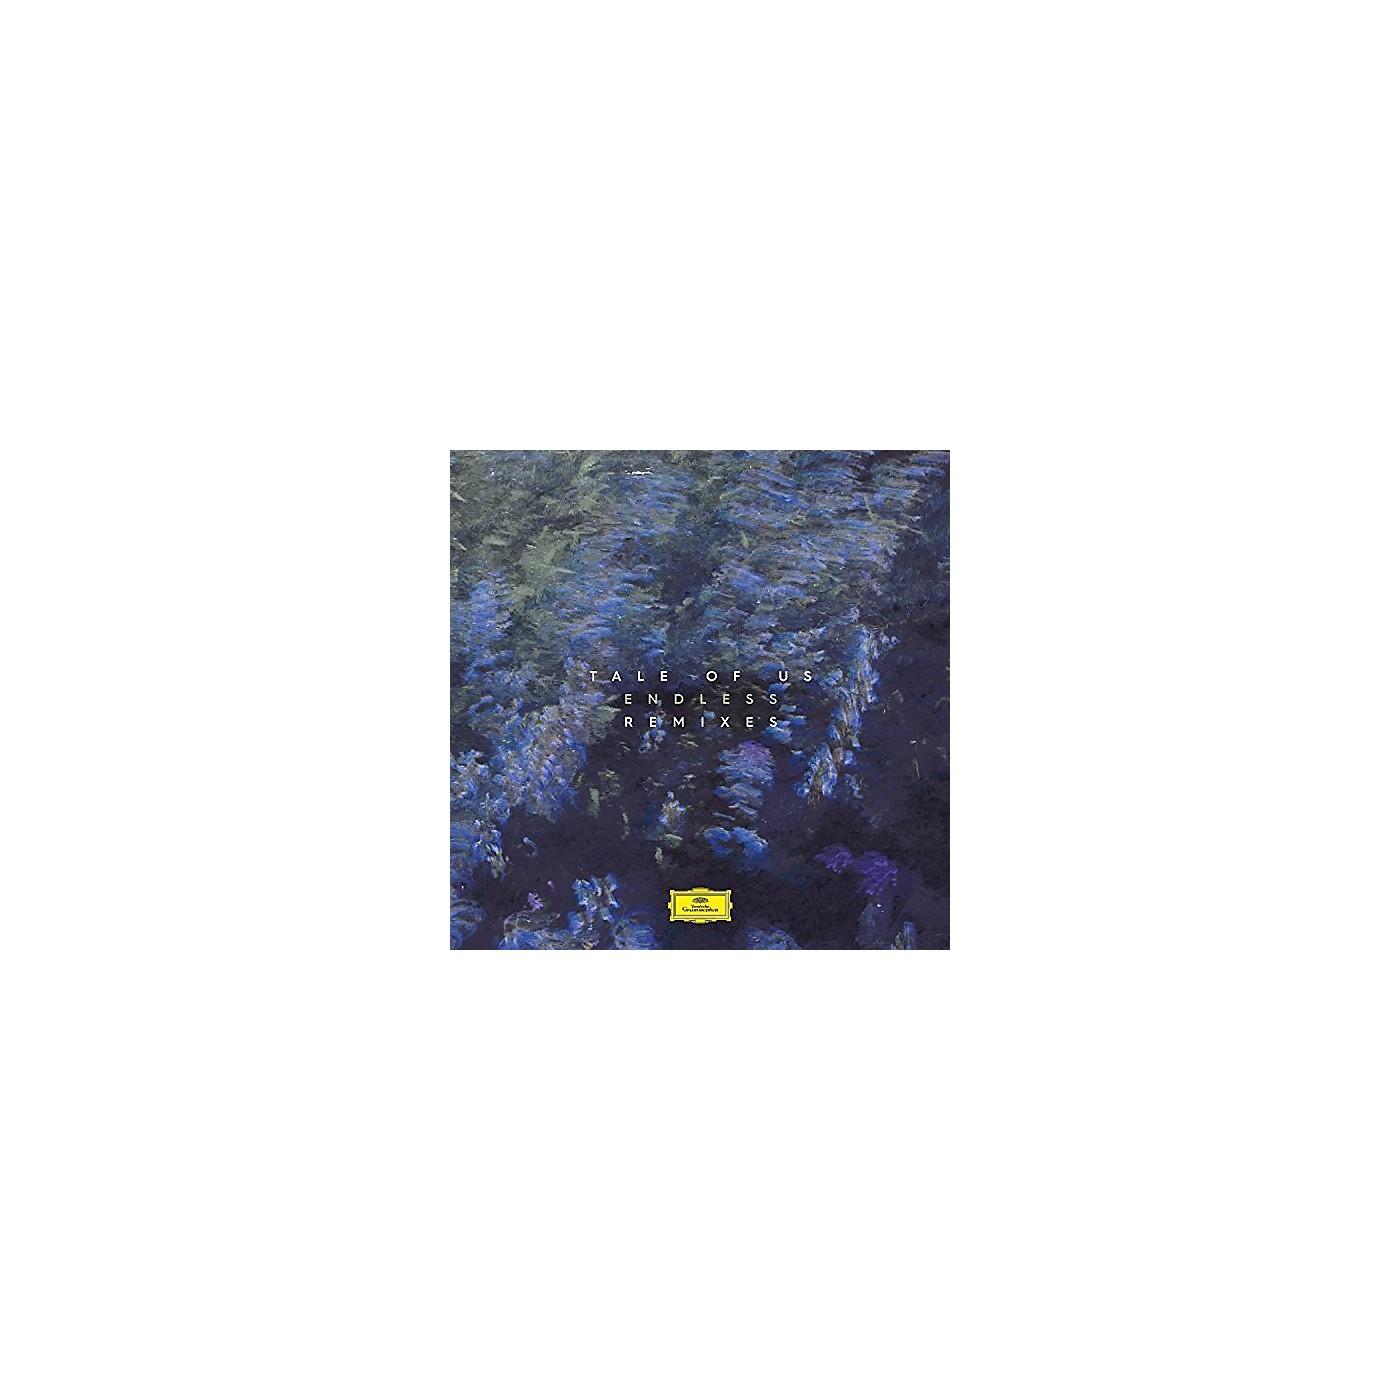 Alliance Tale of Us - Endless (Remixes) thumbnail